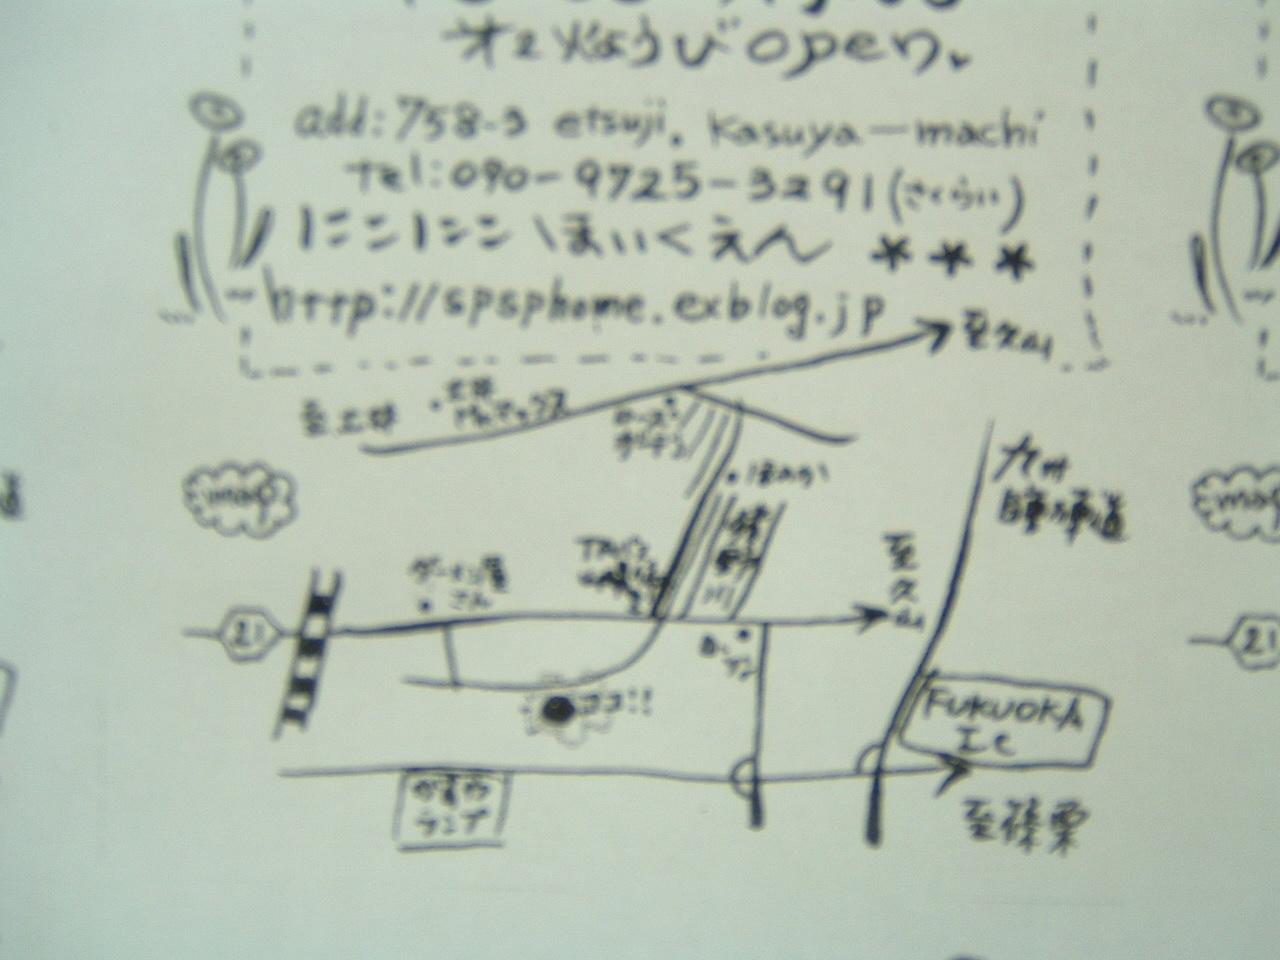 c0171140_23869.jpg